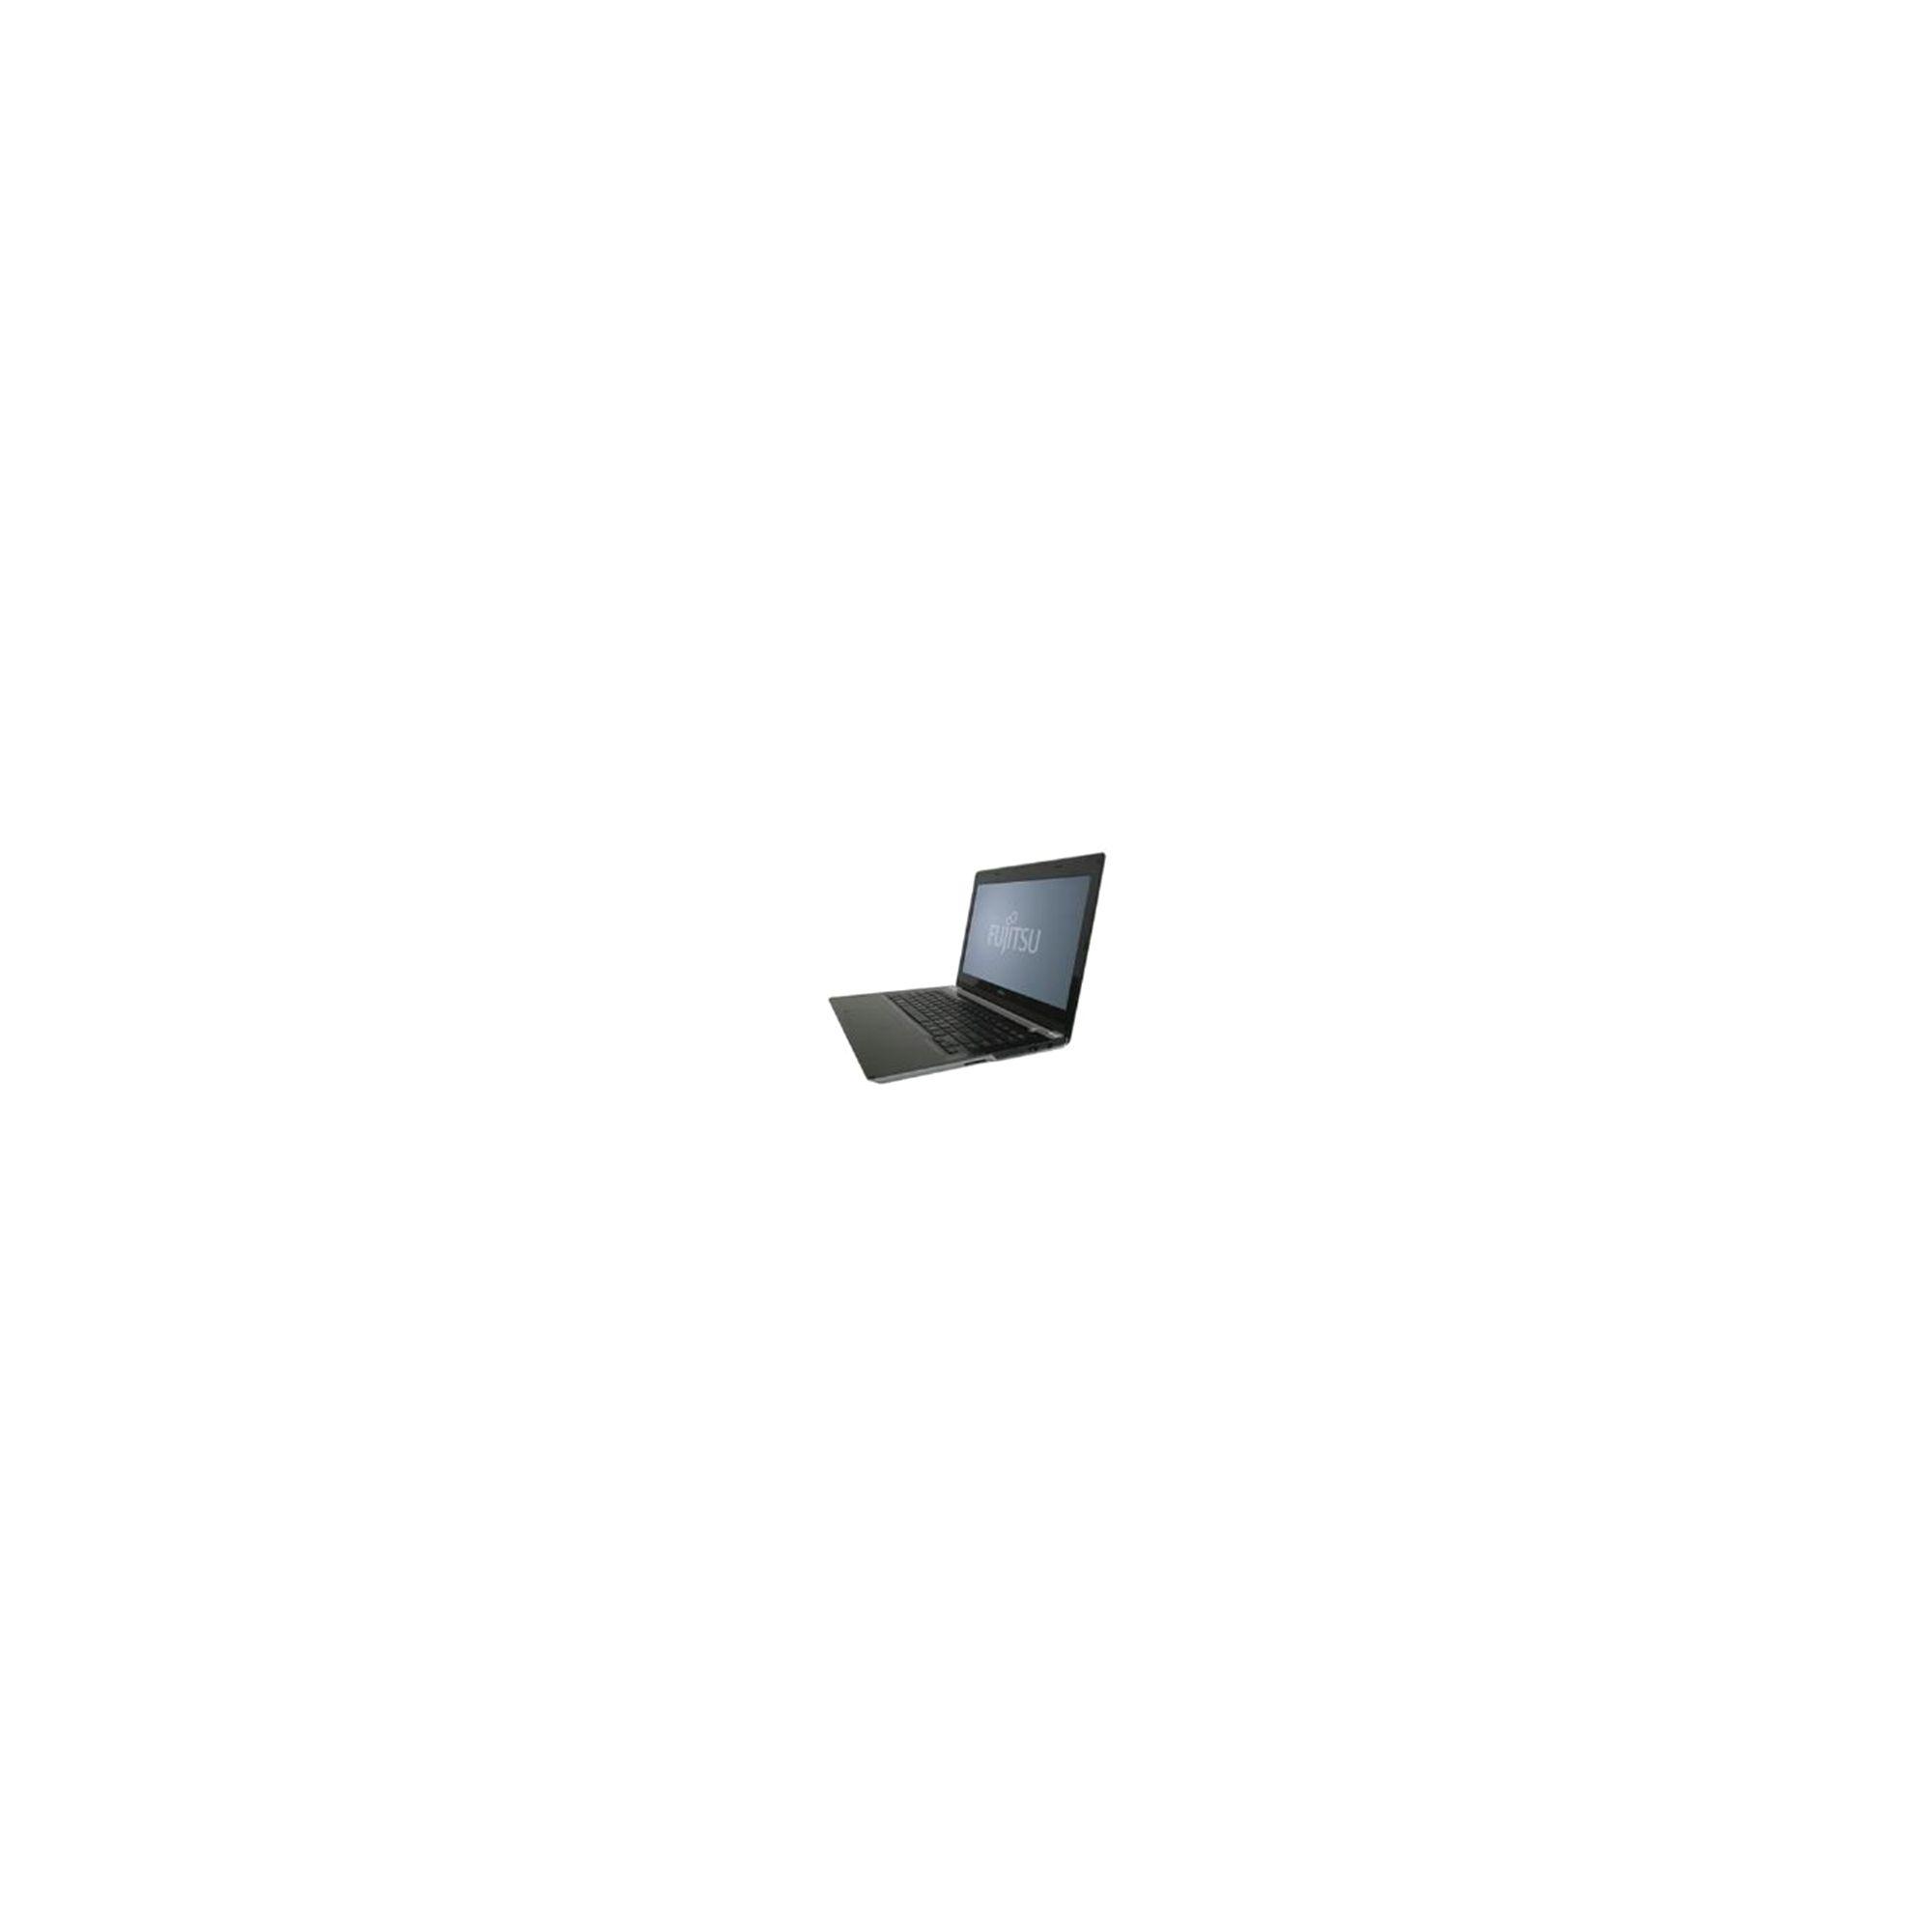 Fujitsu LIFEBOOK UH572 (13.3 inch) Notebook Core i7 (3517U) 1.9 GHz 4GB 128GB SSD (No OD) WLAN BT Webcam Windows 8 Pro 64-bit (Intel HD 4000) Silver at Tescos Direct